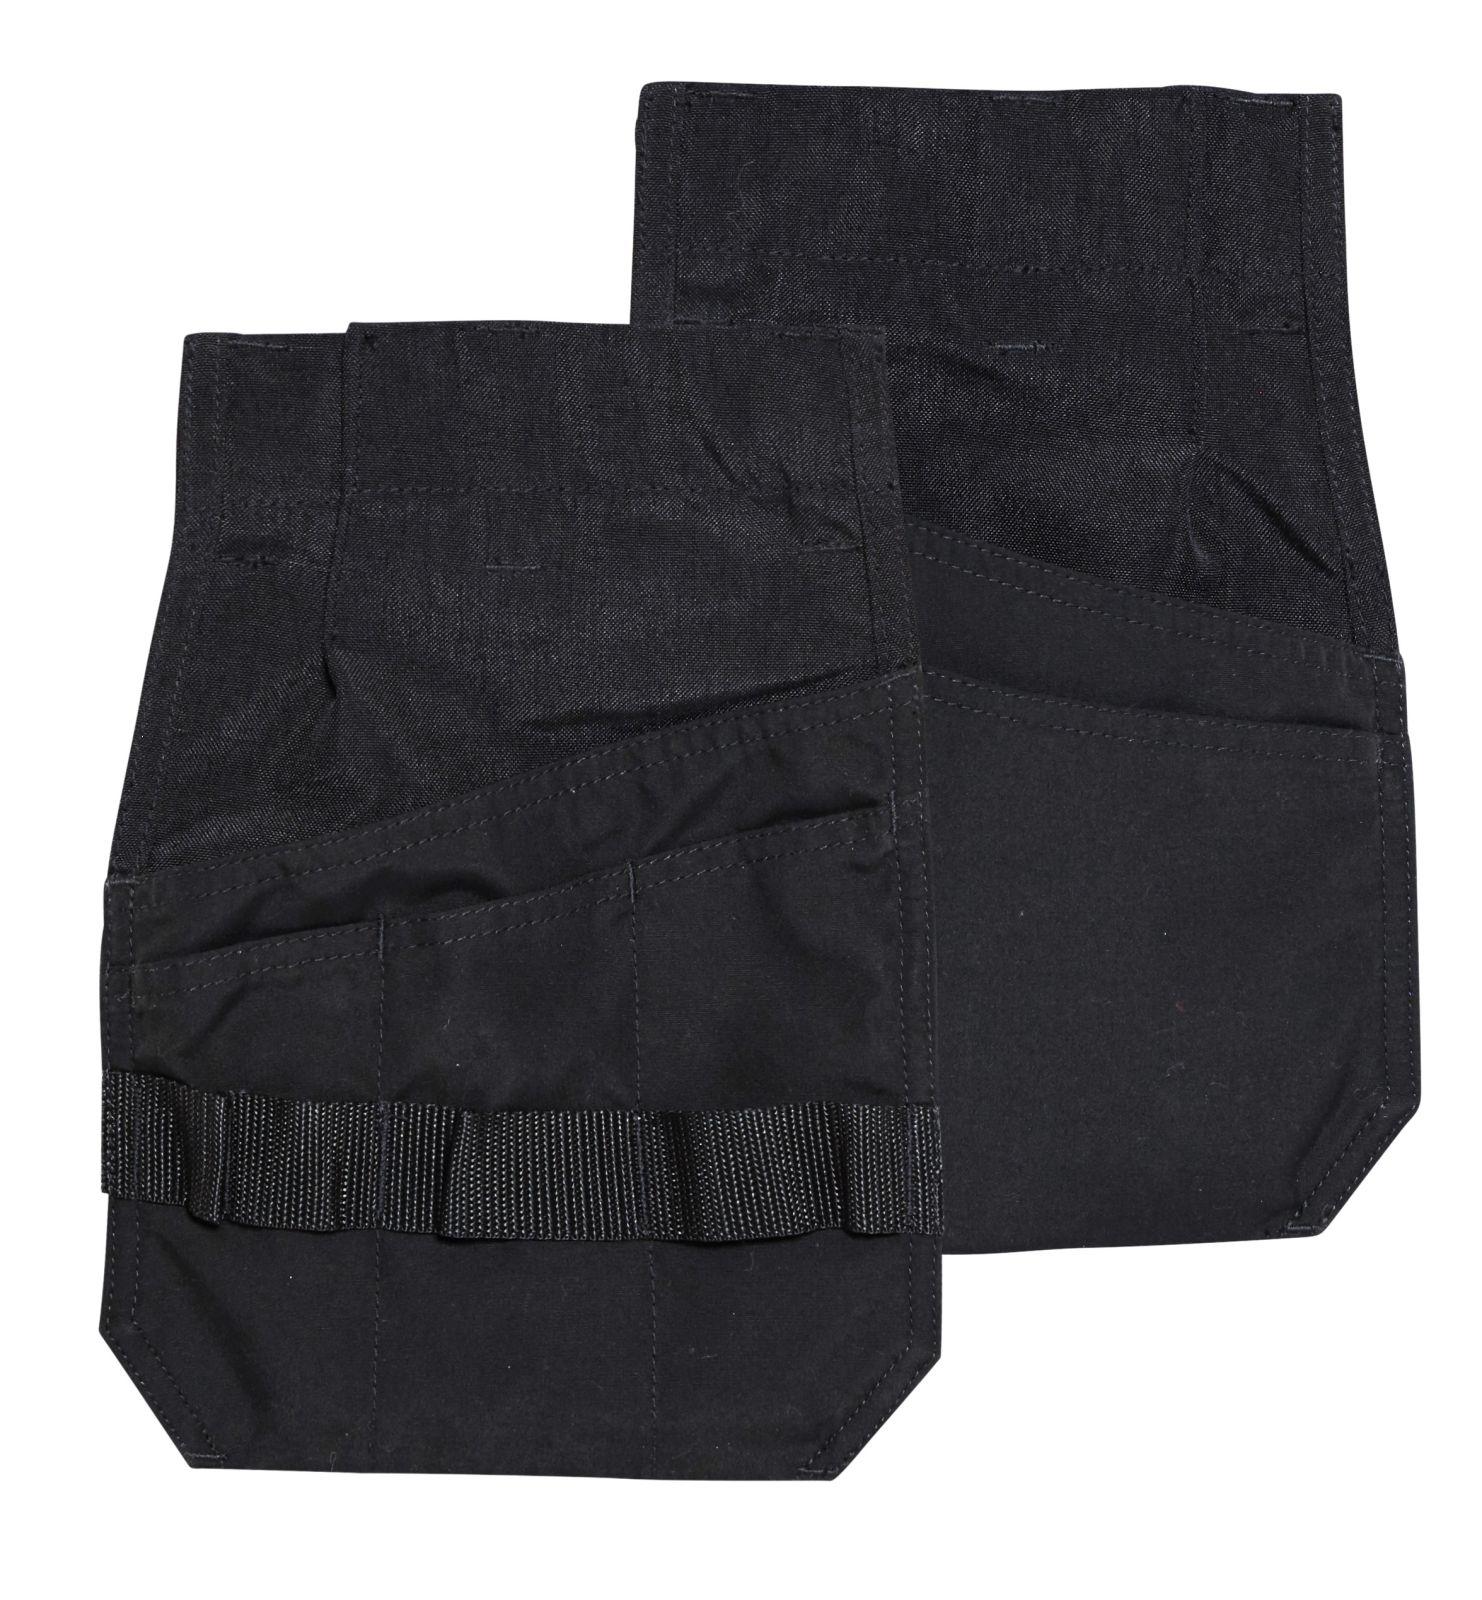 Blaklader Losse spijkerzakken 21591860 zwart(9900)